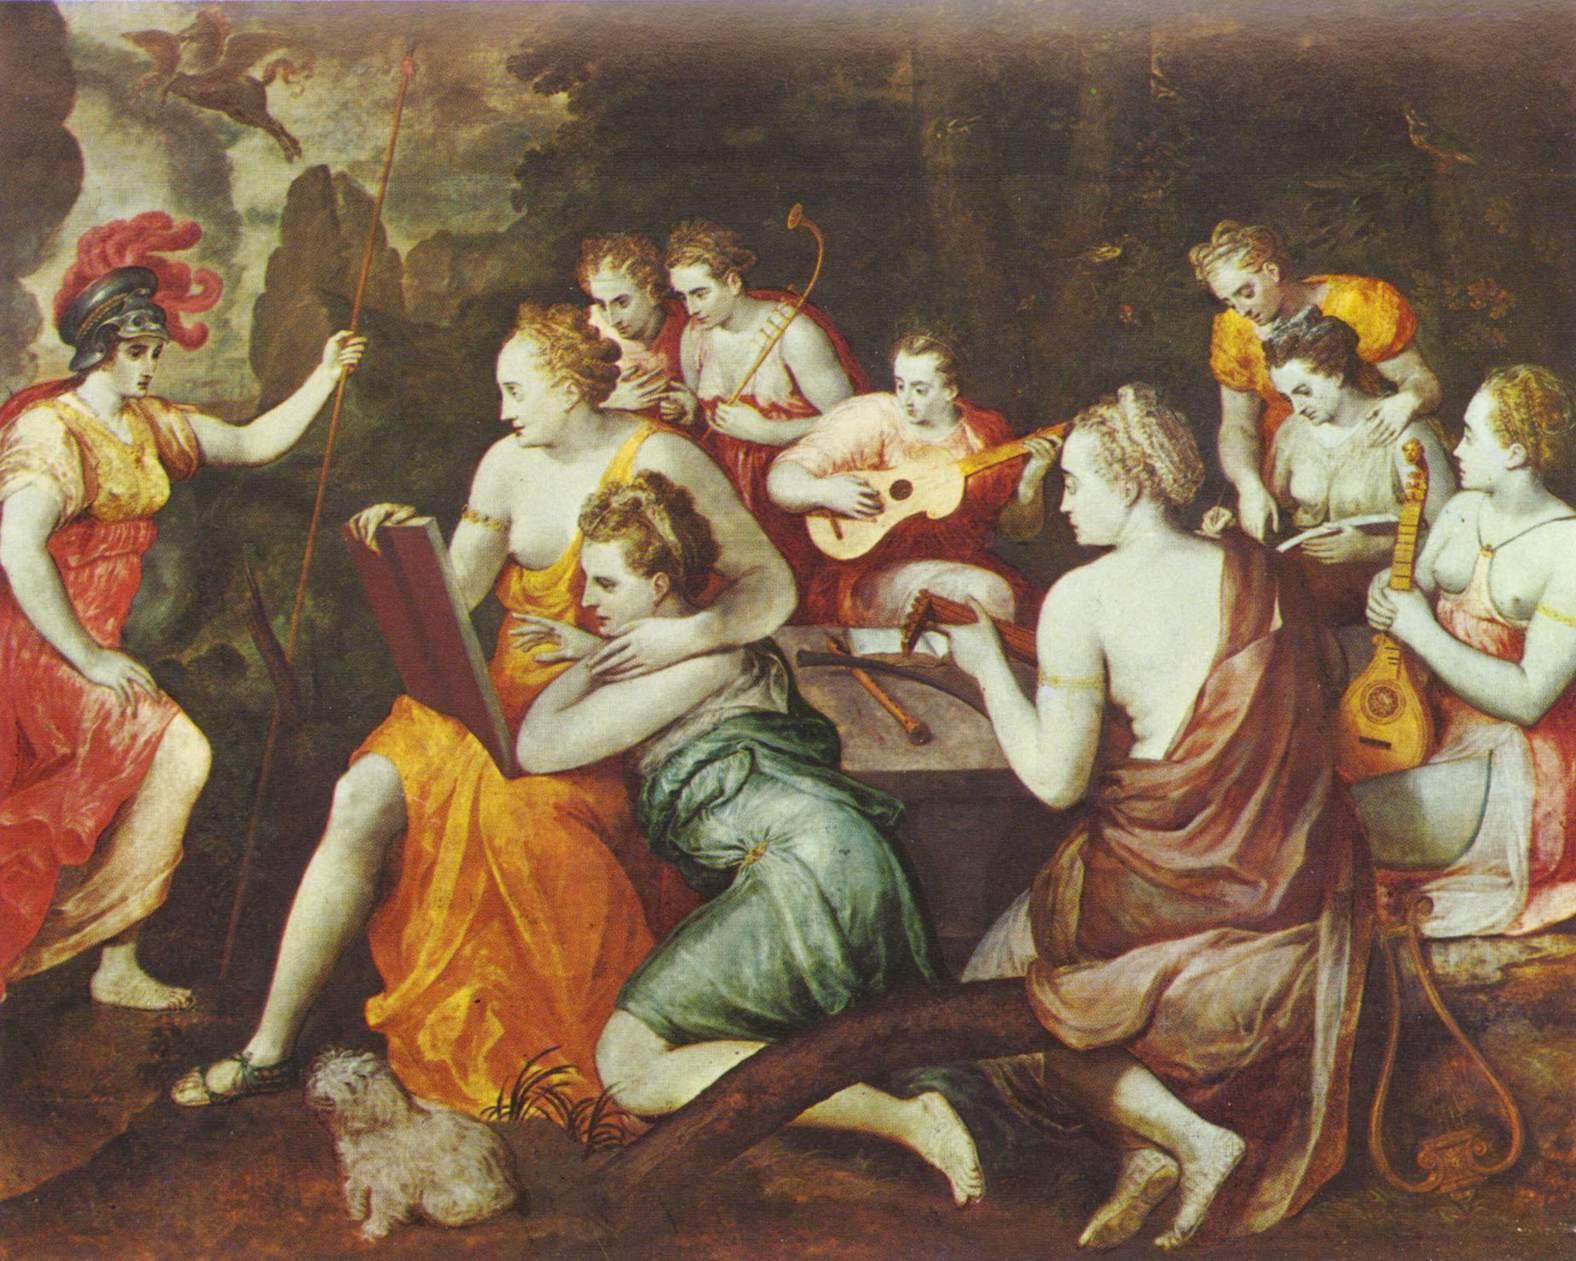 Mitologia Grega: Mnemosine e as Musas